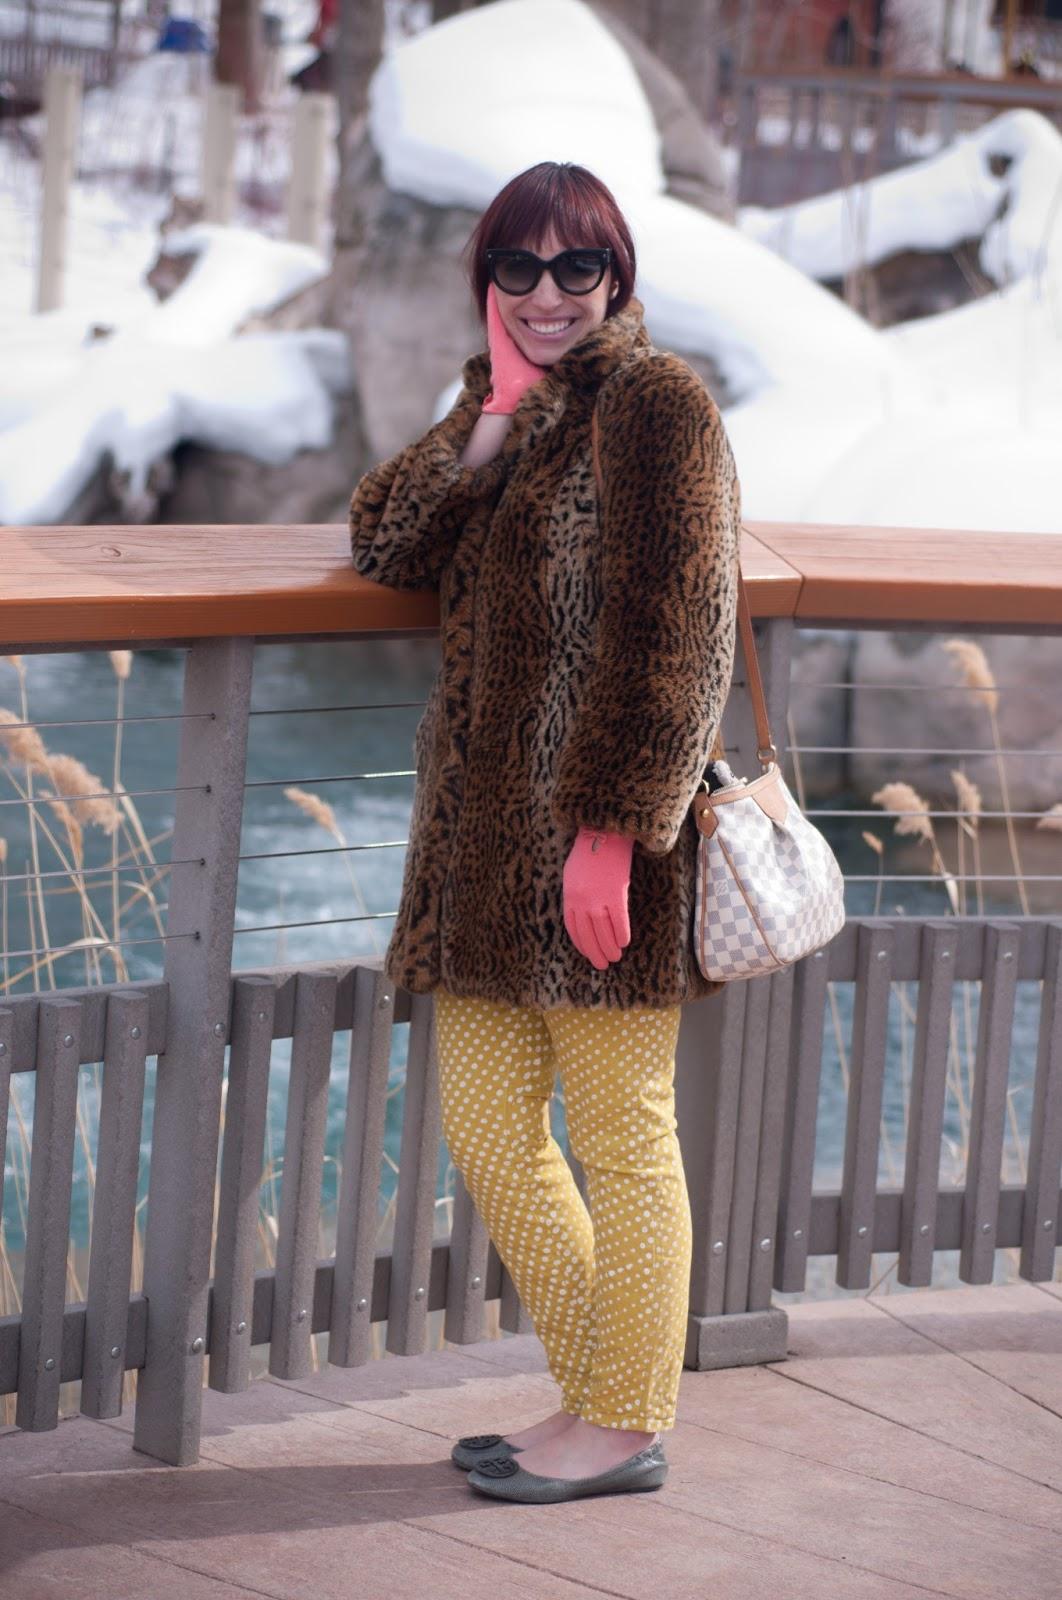 hogle zoo, utah zoo, animals, fashion blog, fashion blogger, style blog, style blogger, mens fashion, mens fashion blog, mens style, mens style blog, womens style blog, anthropologie ootd blog, anthropologie ootd, anthropologie, ootd, mens ootd, womens ootd,